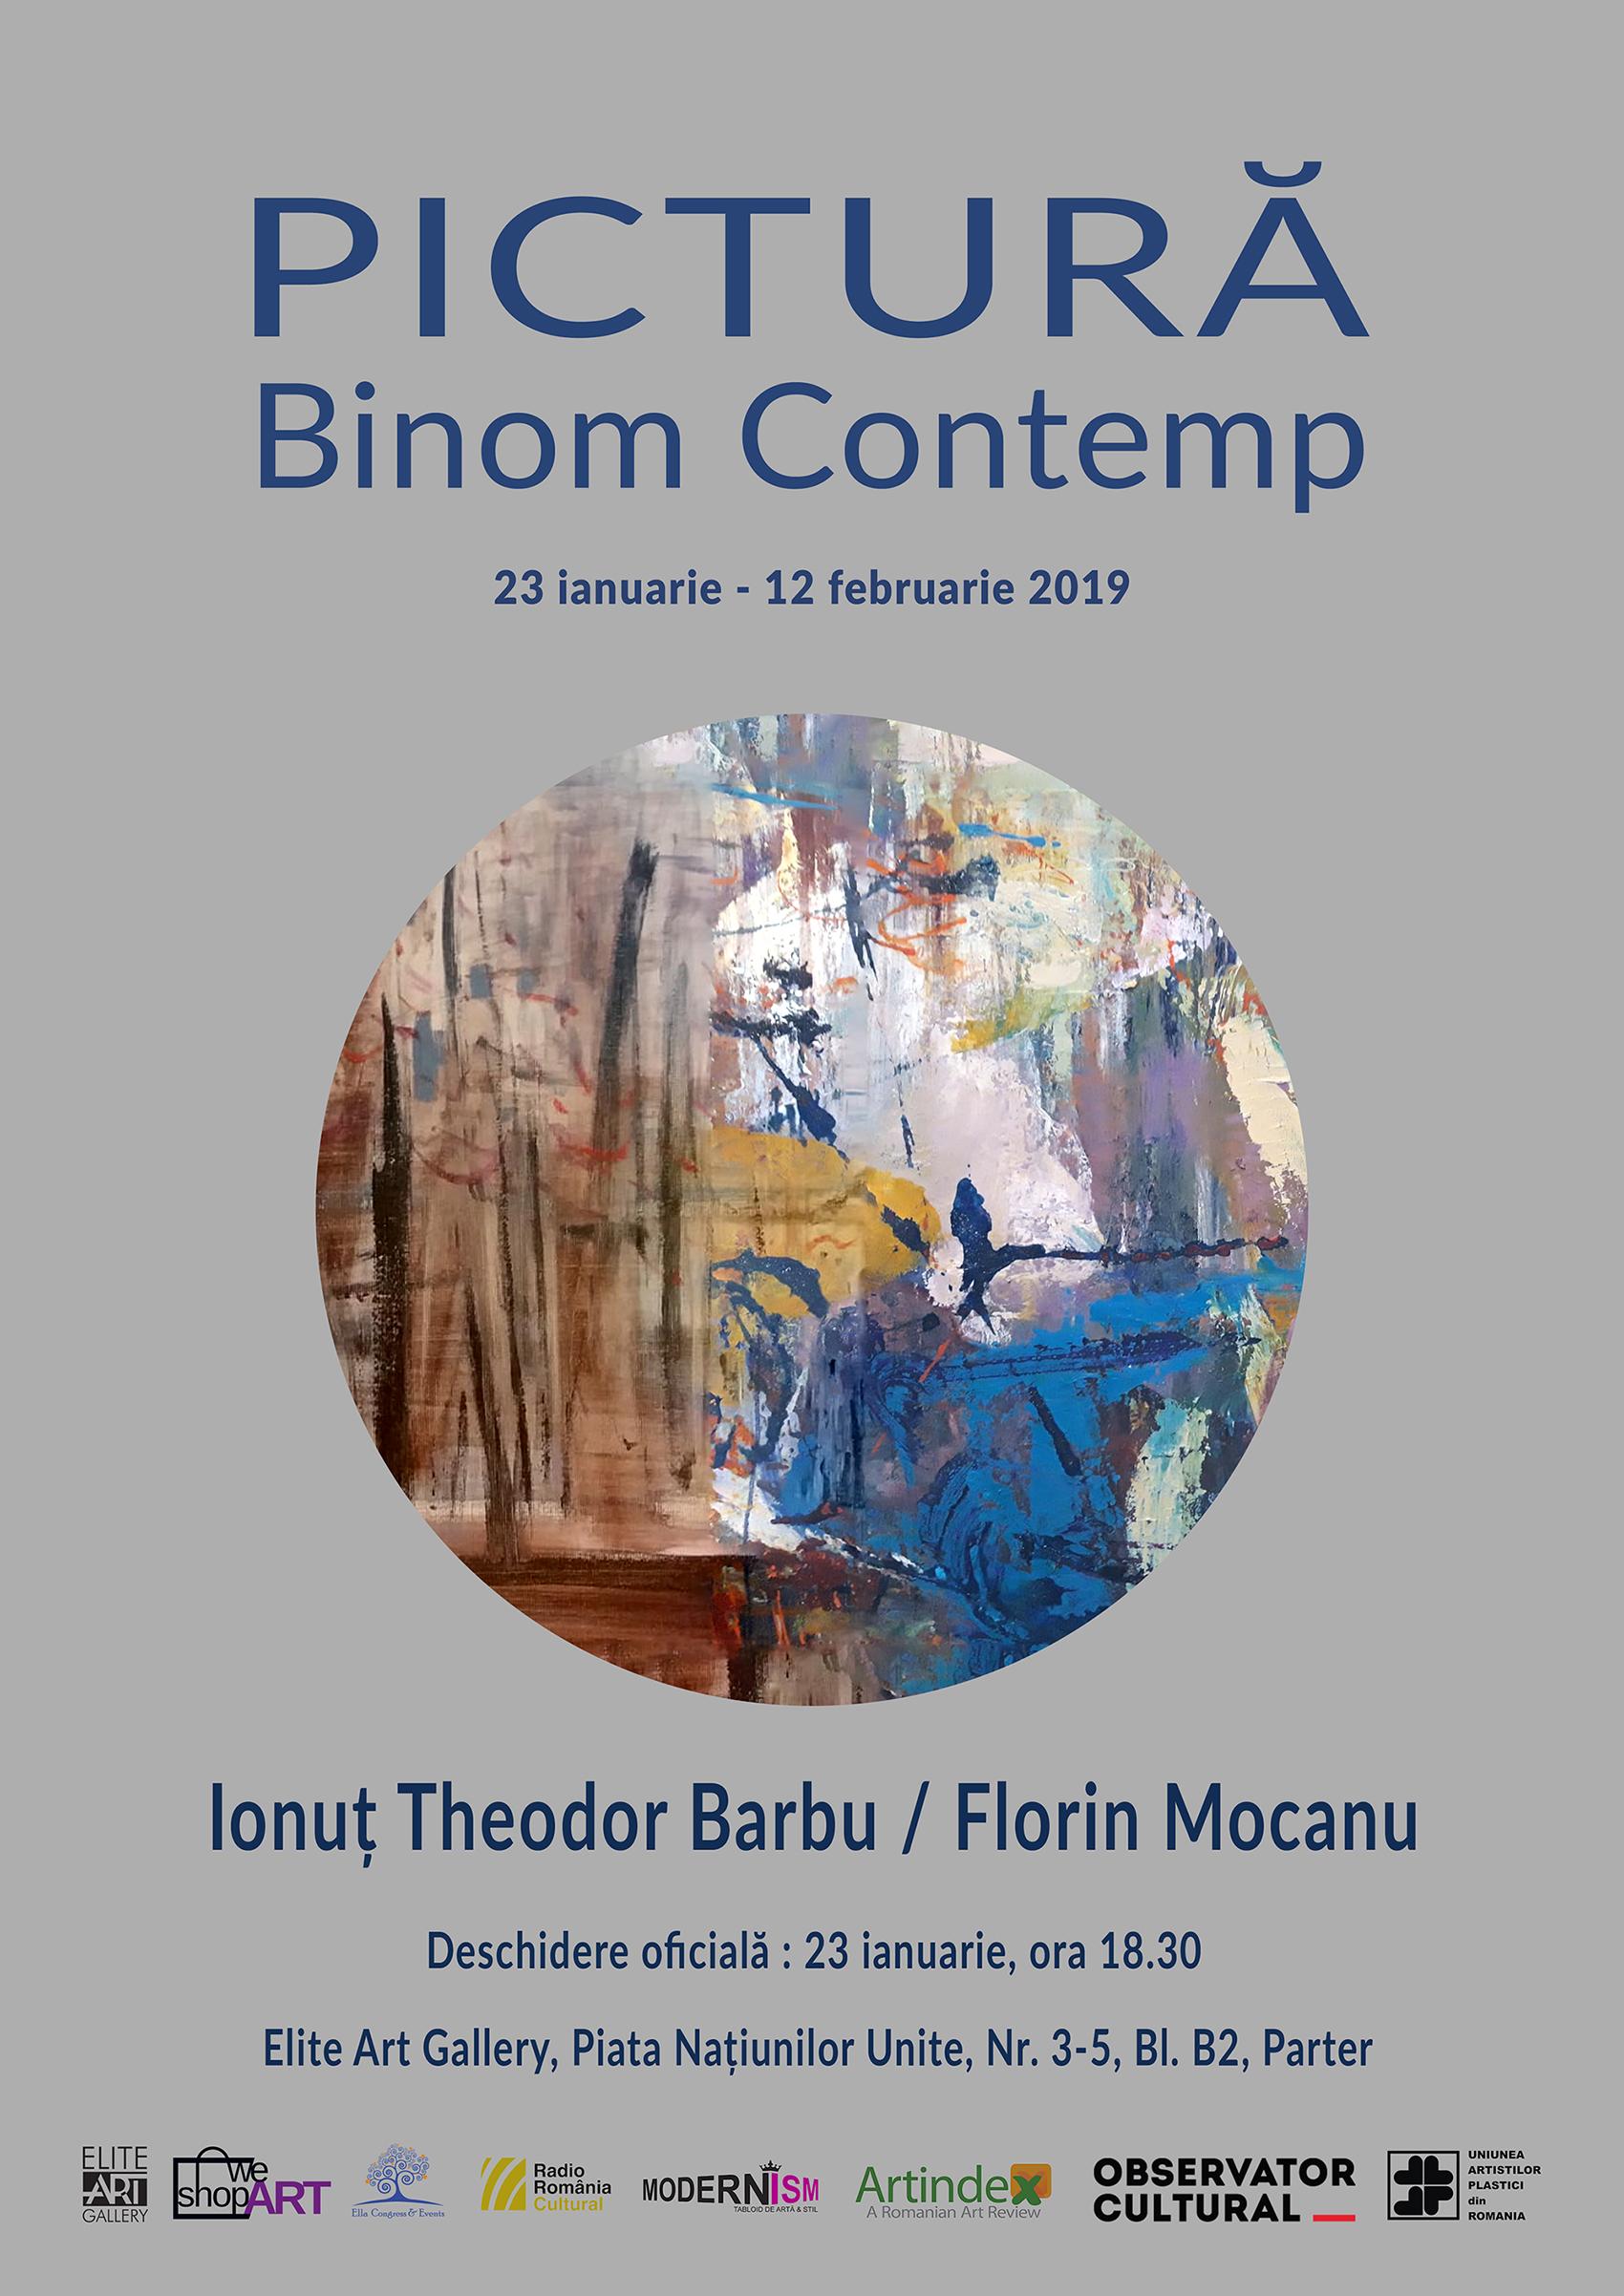 Binom Contemp3